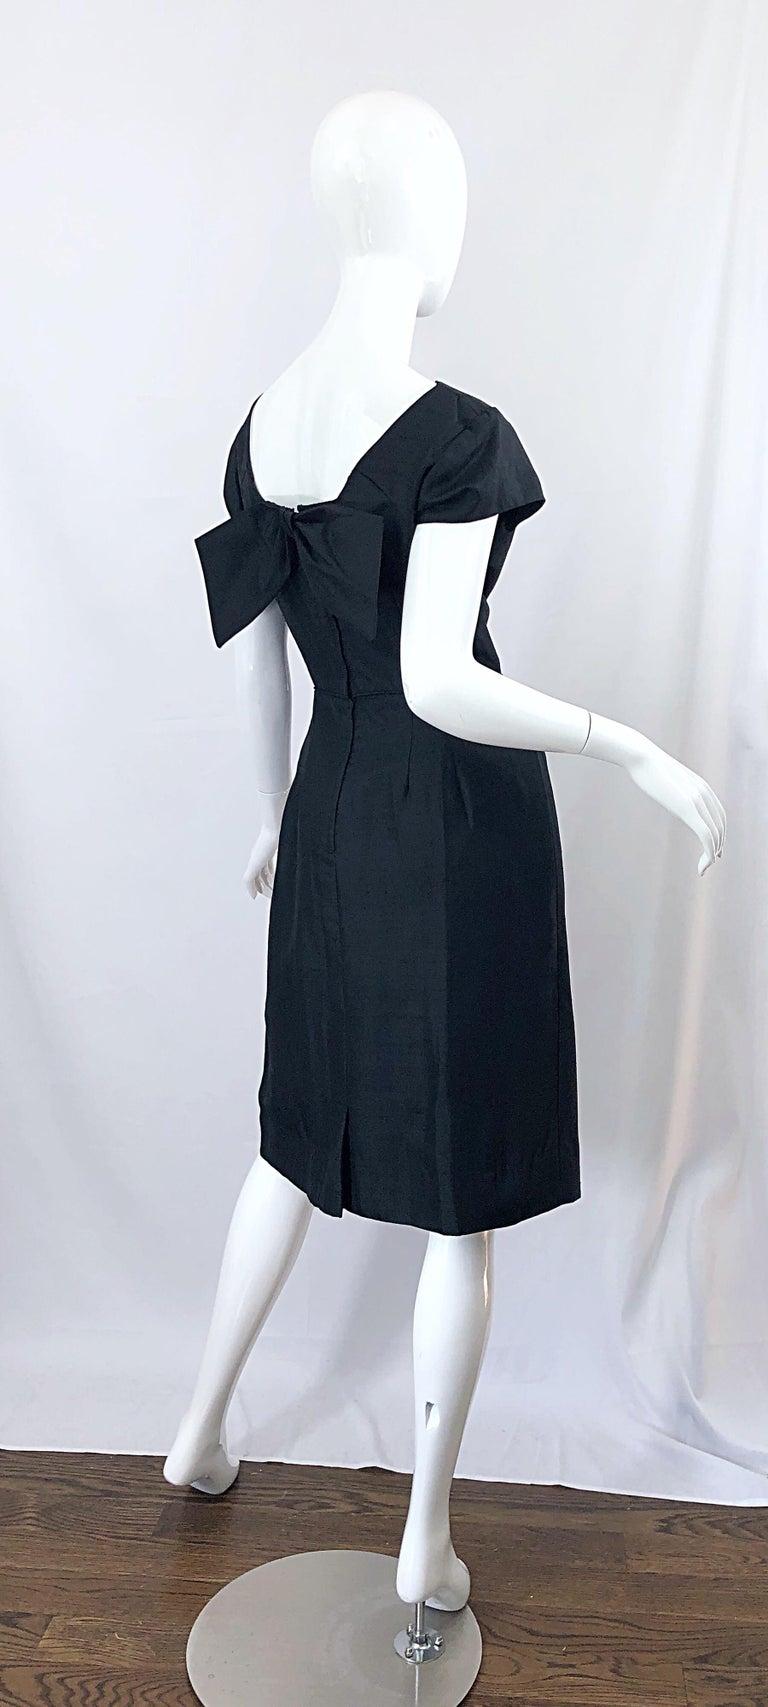 1950s Demi Couture Black Silk Cut - Out Chic Vintage 50s Cocktail Dress For Sale 11